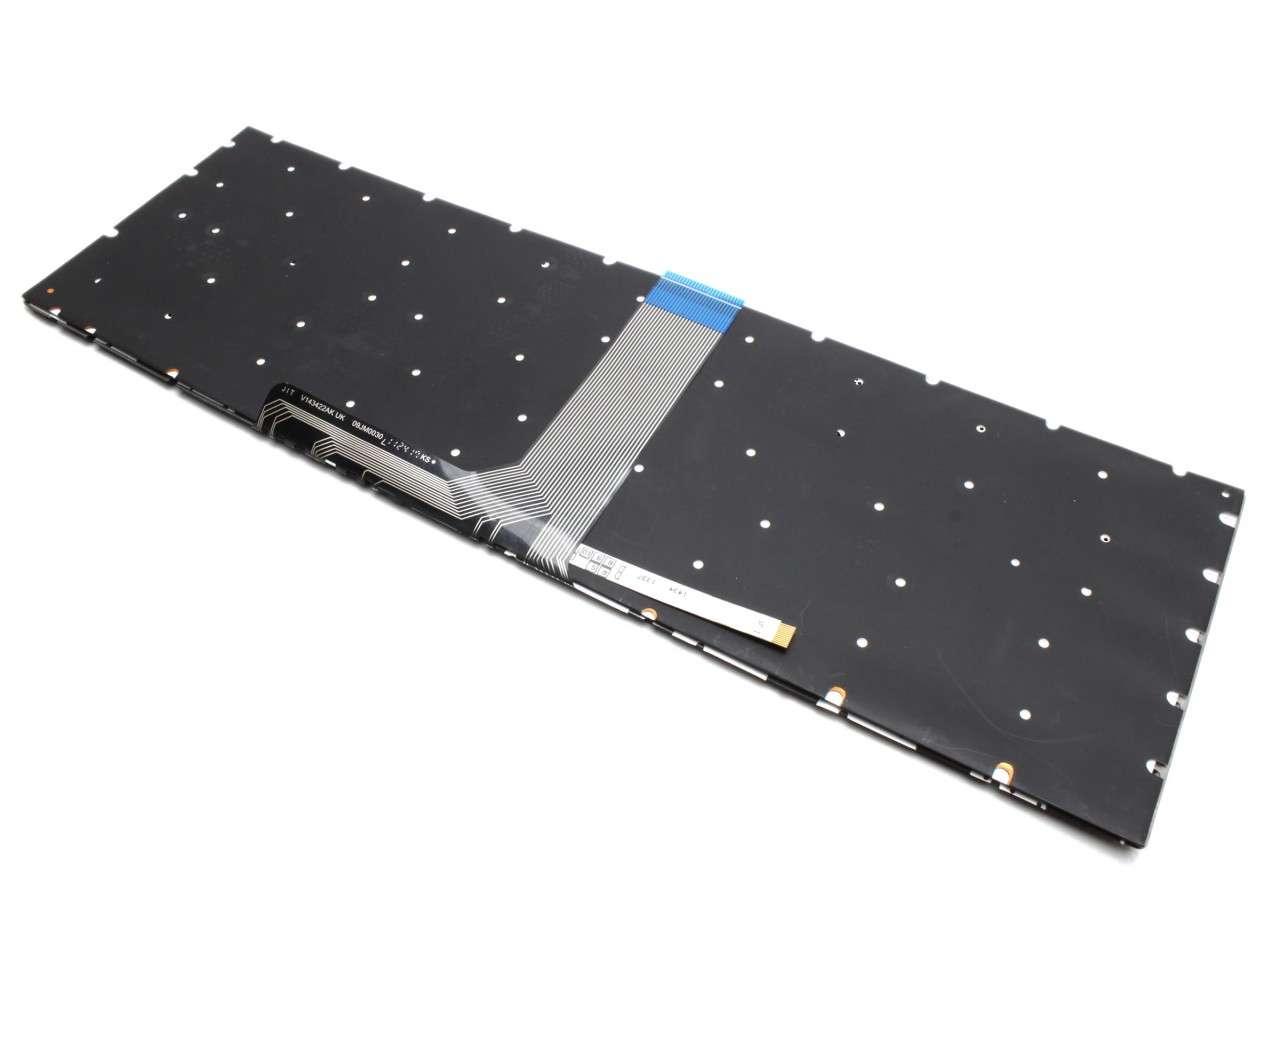 Tastatura MSI GS60 6QE Ghost Pro iluminata backlit